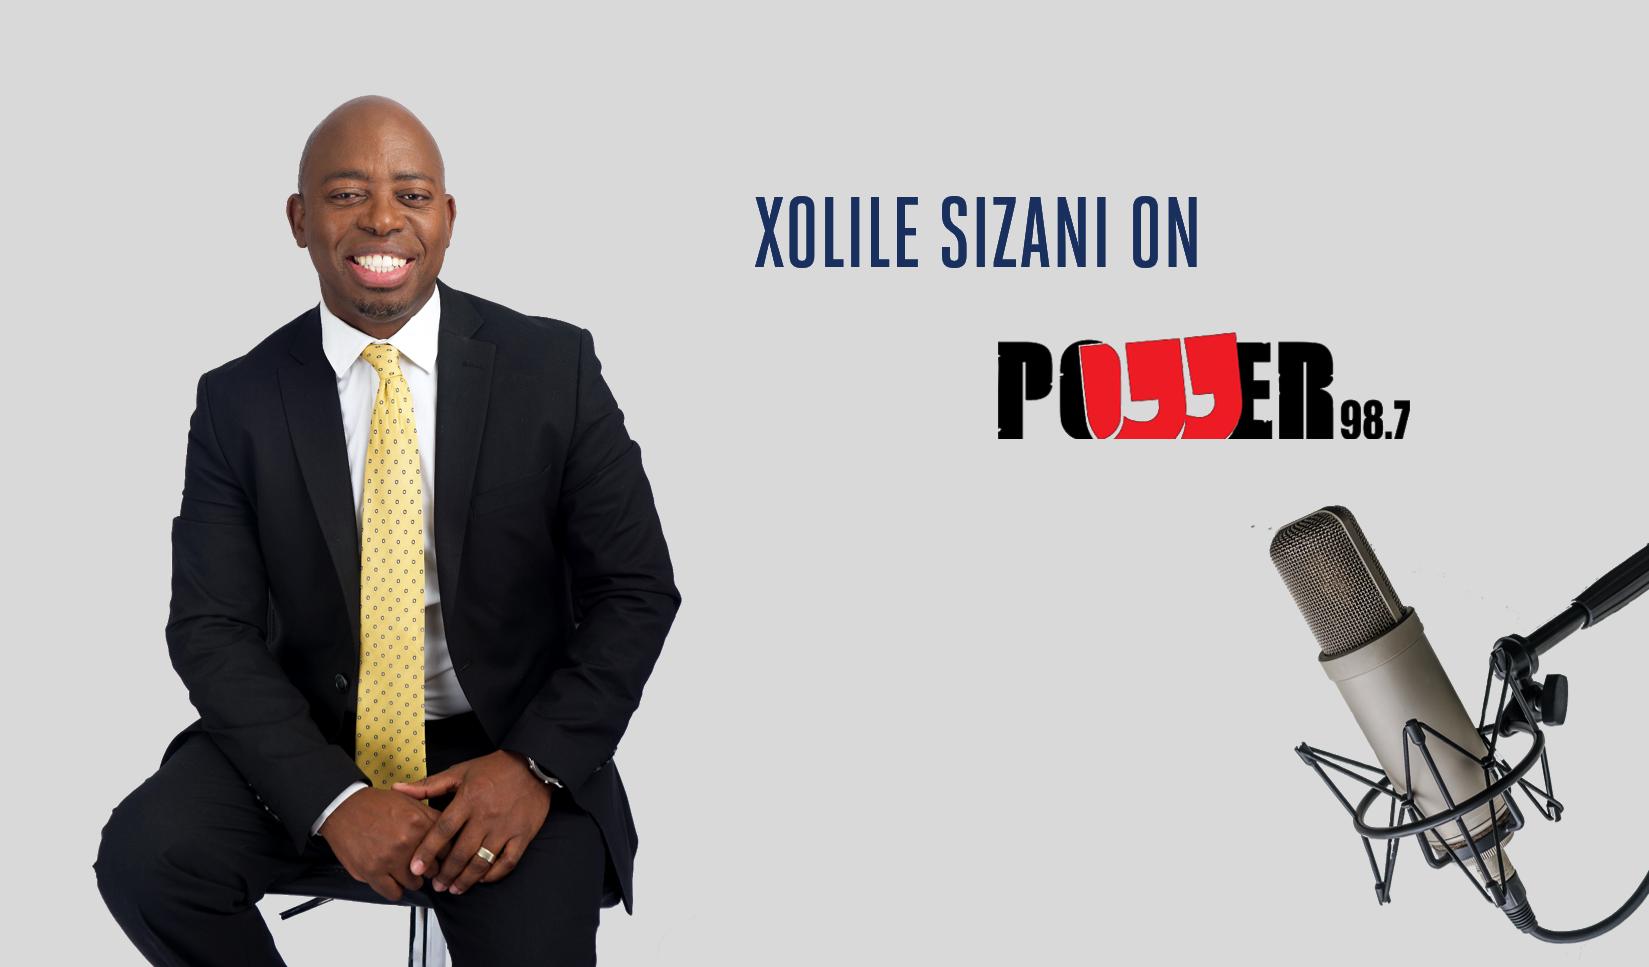 Servest CEO, Xolile Sizani on Power FM